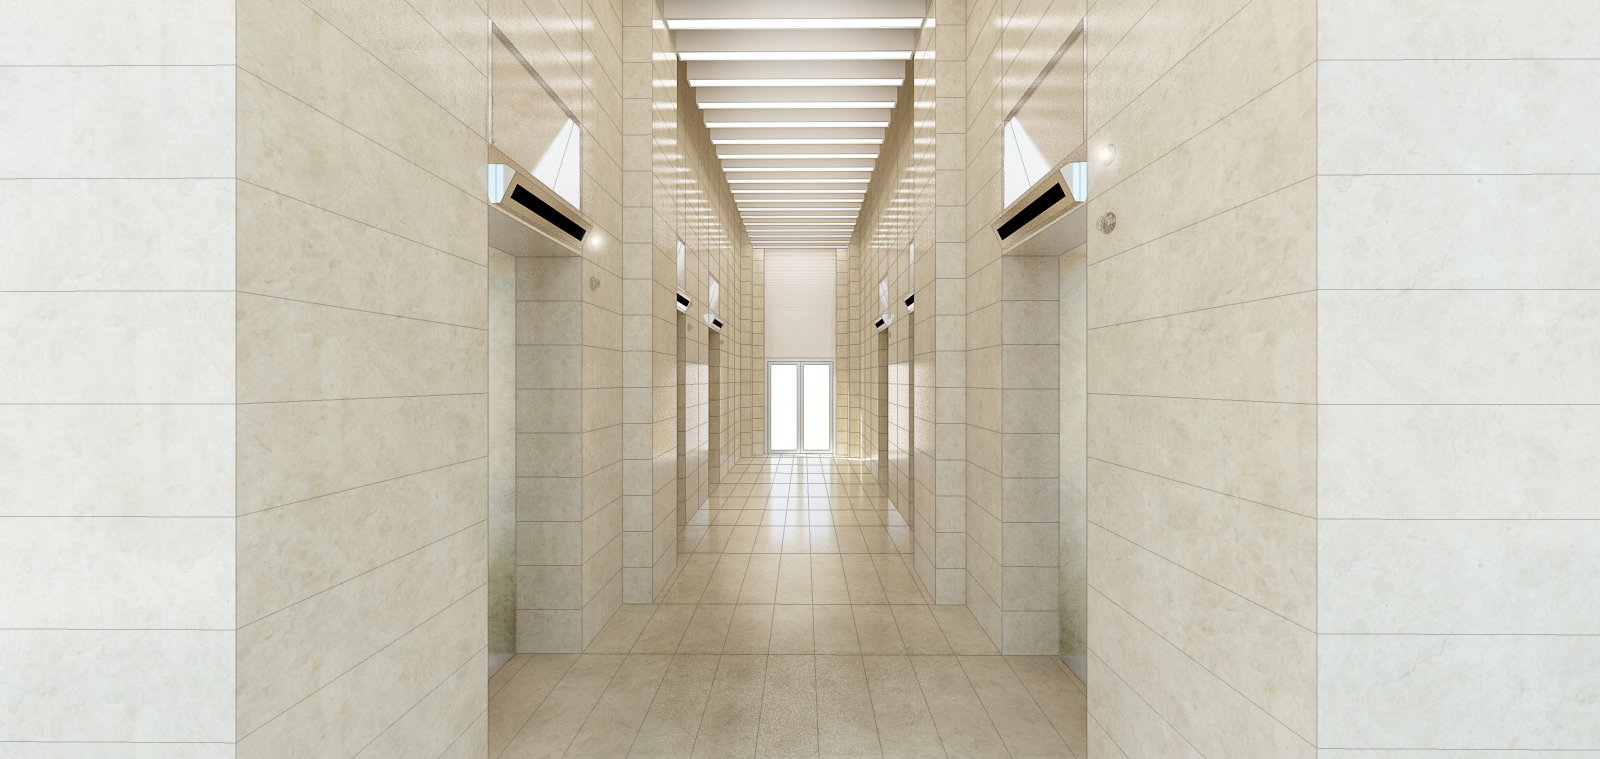 02_LOBBY ELEVATOR HALL